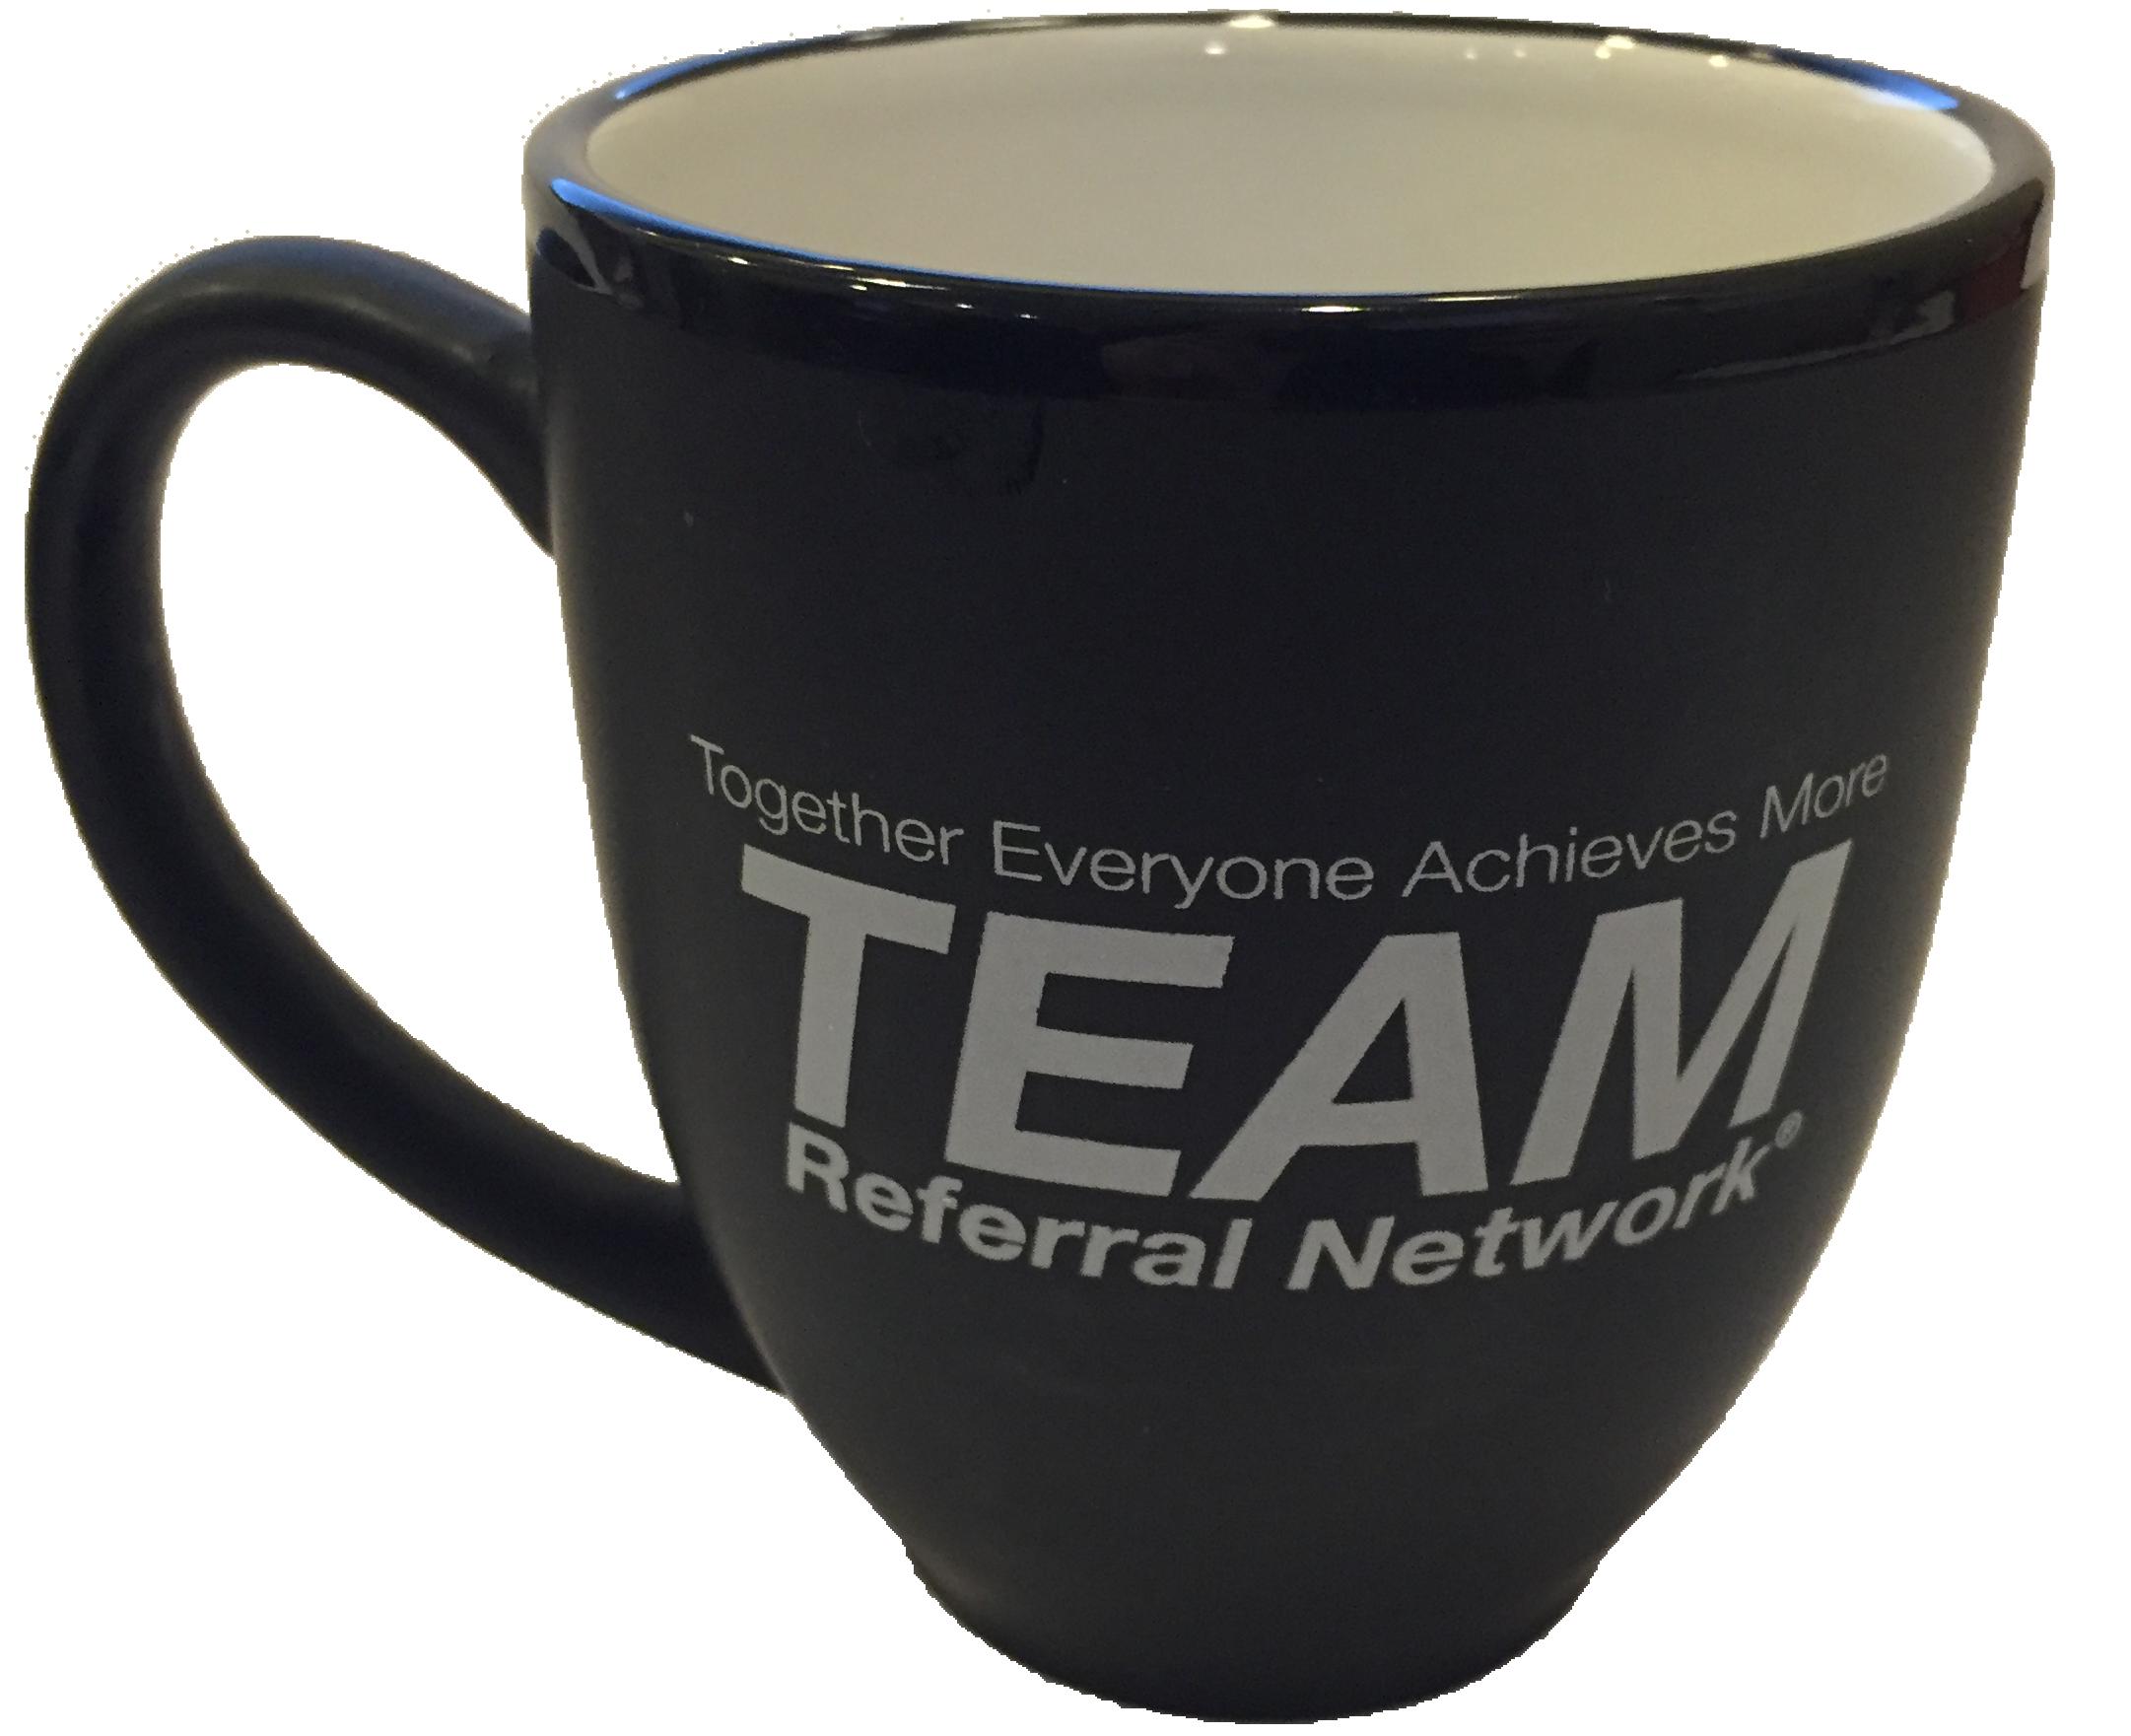 TEAM_Referral_Netowkr_Coffee_Mug